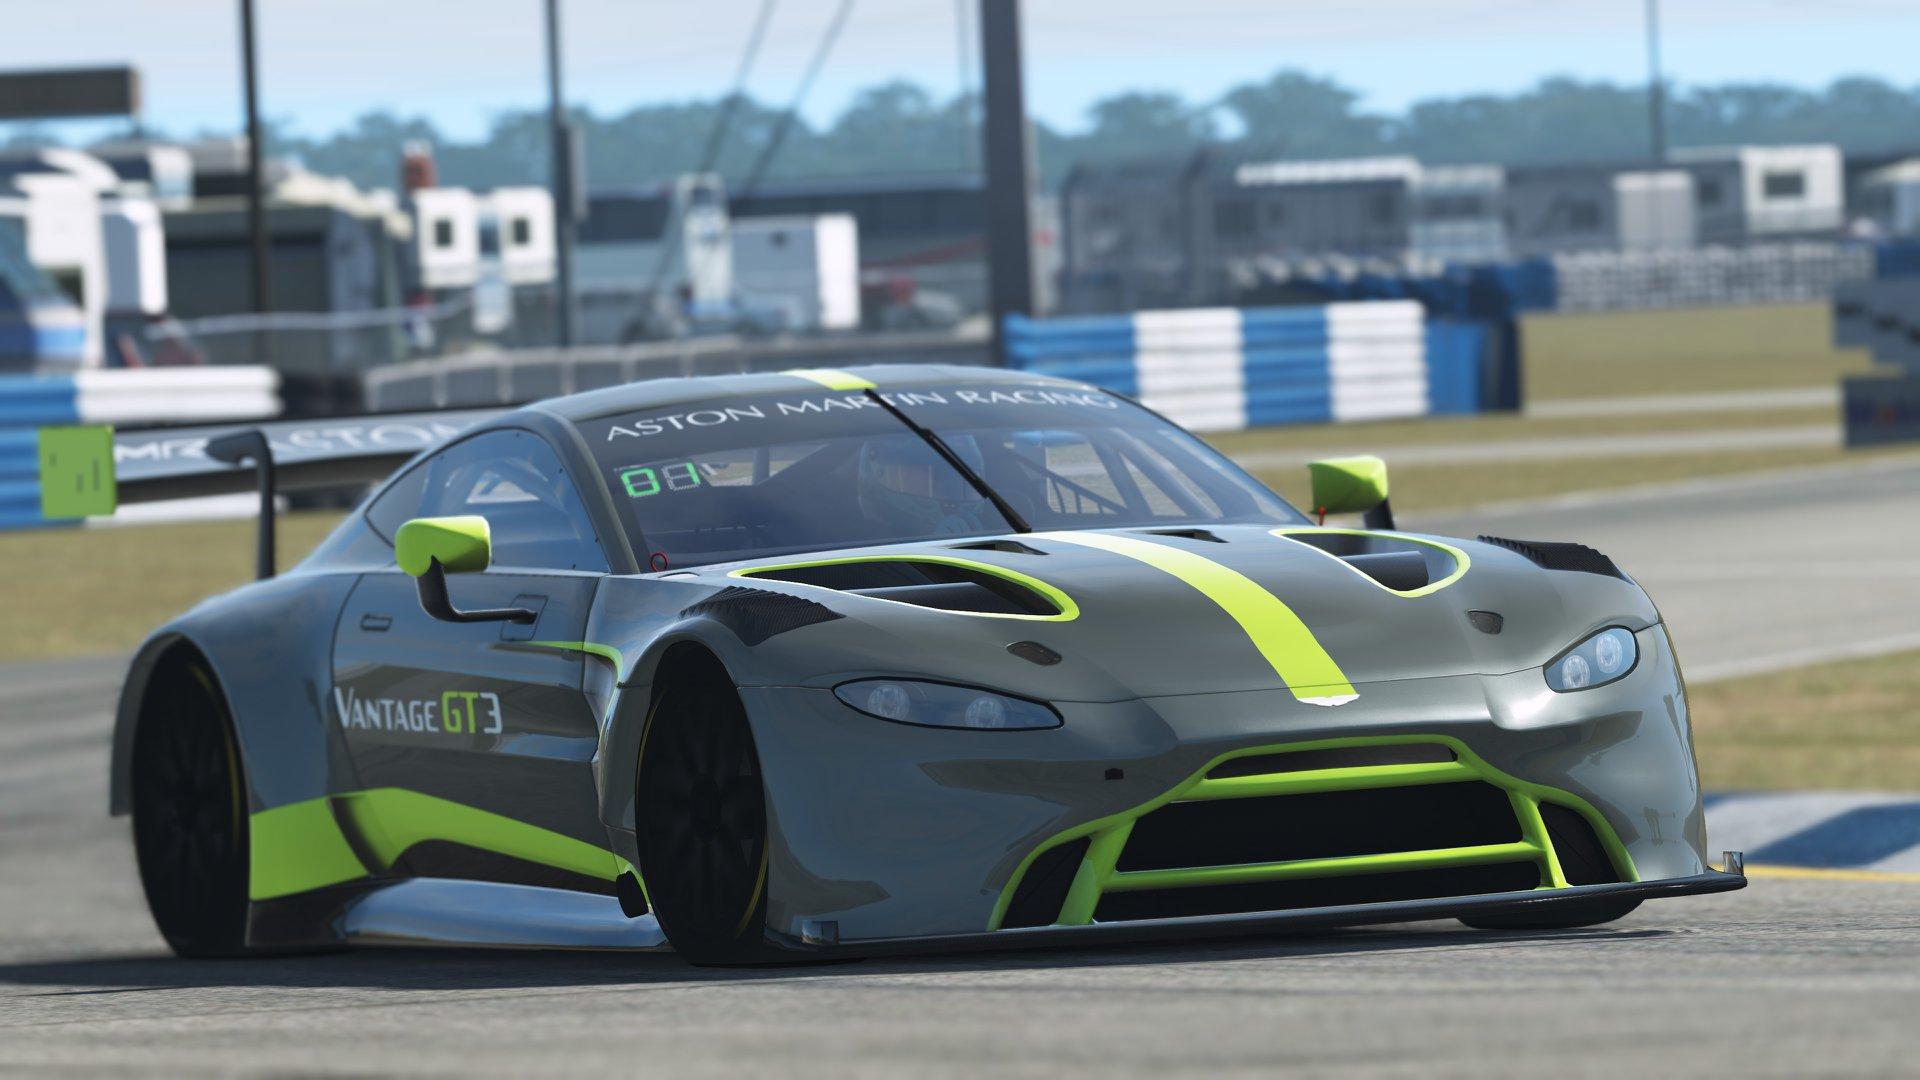 Rfactor 2 Aston Martin Vantage Gt3 Released Bsimracing